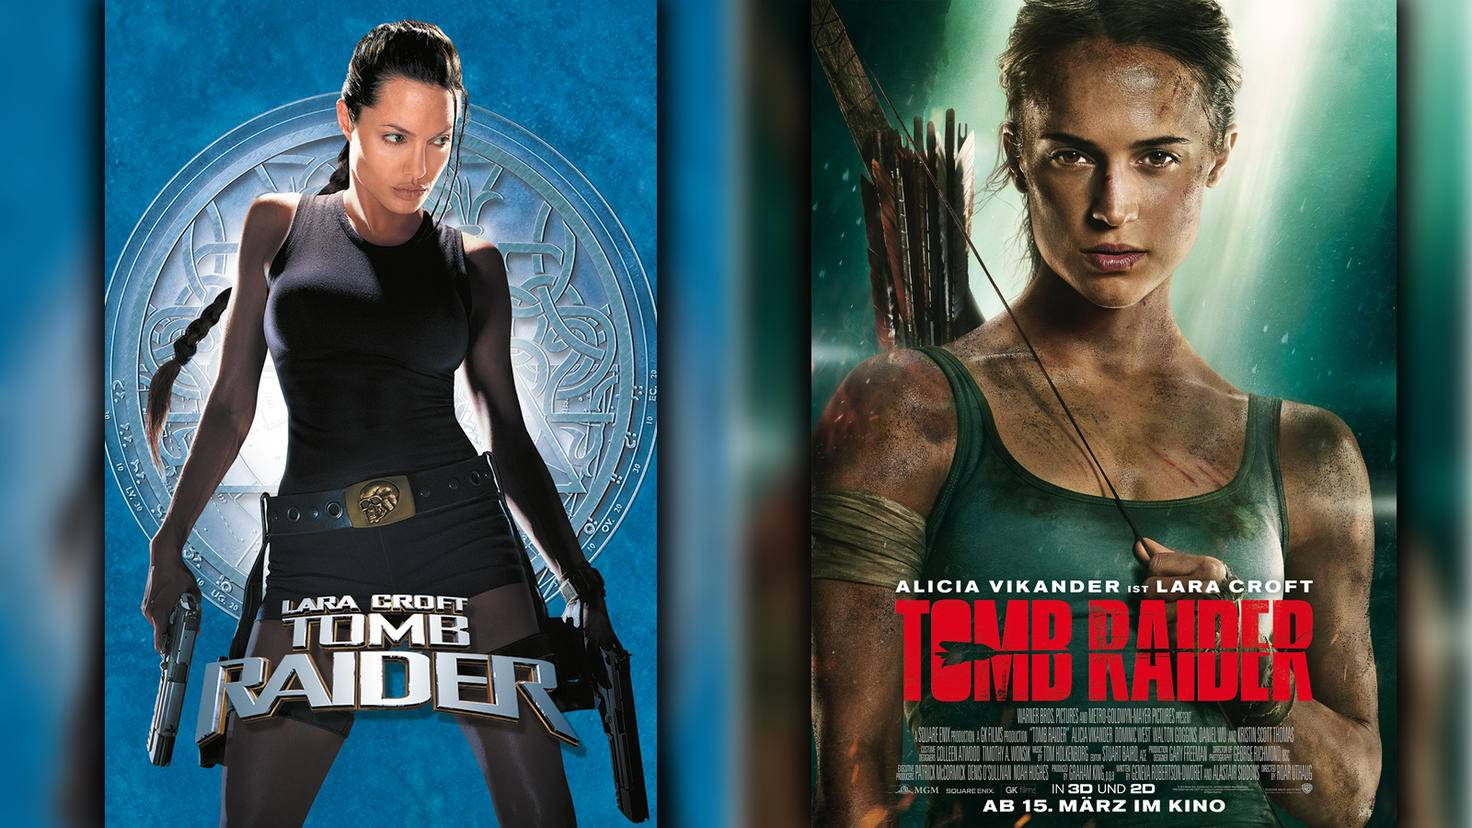 Tomb Raider Lara Croft-Concorde Film-Warner Bros